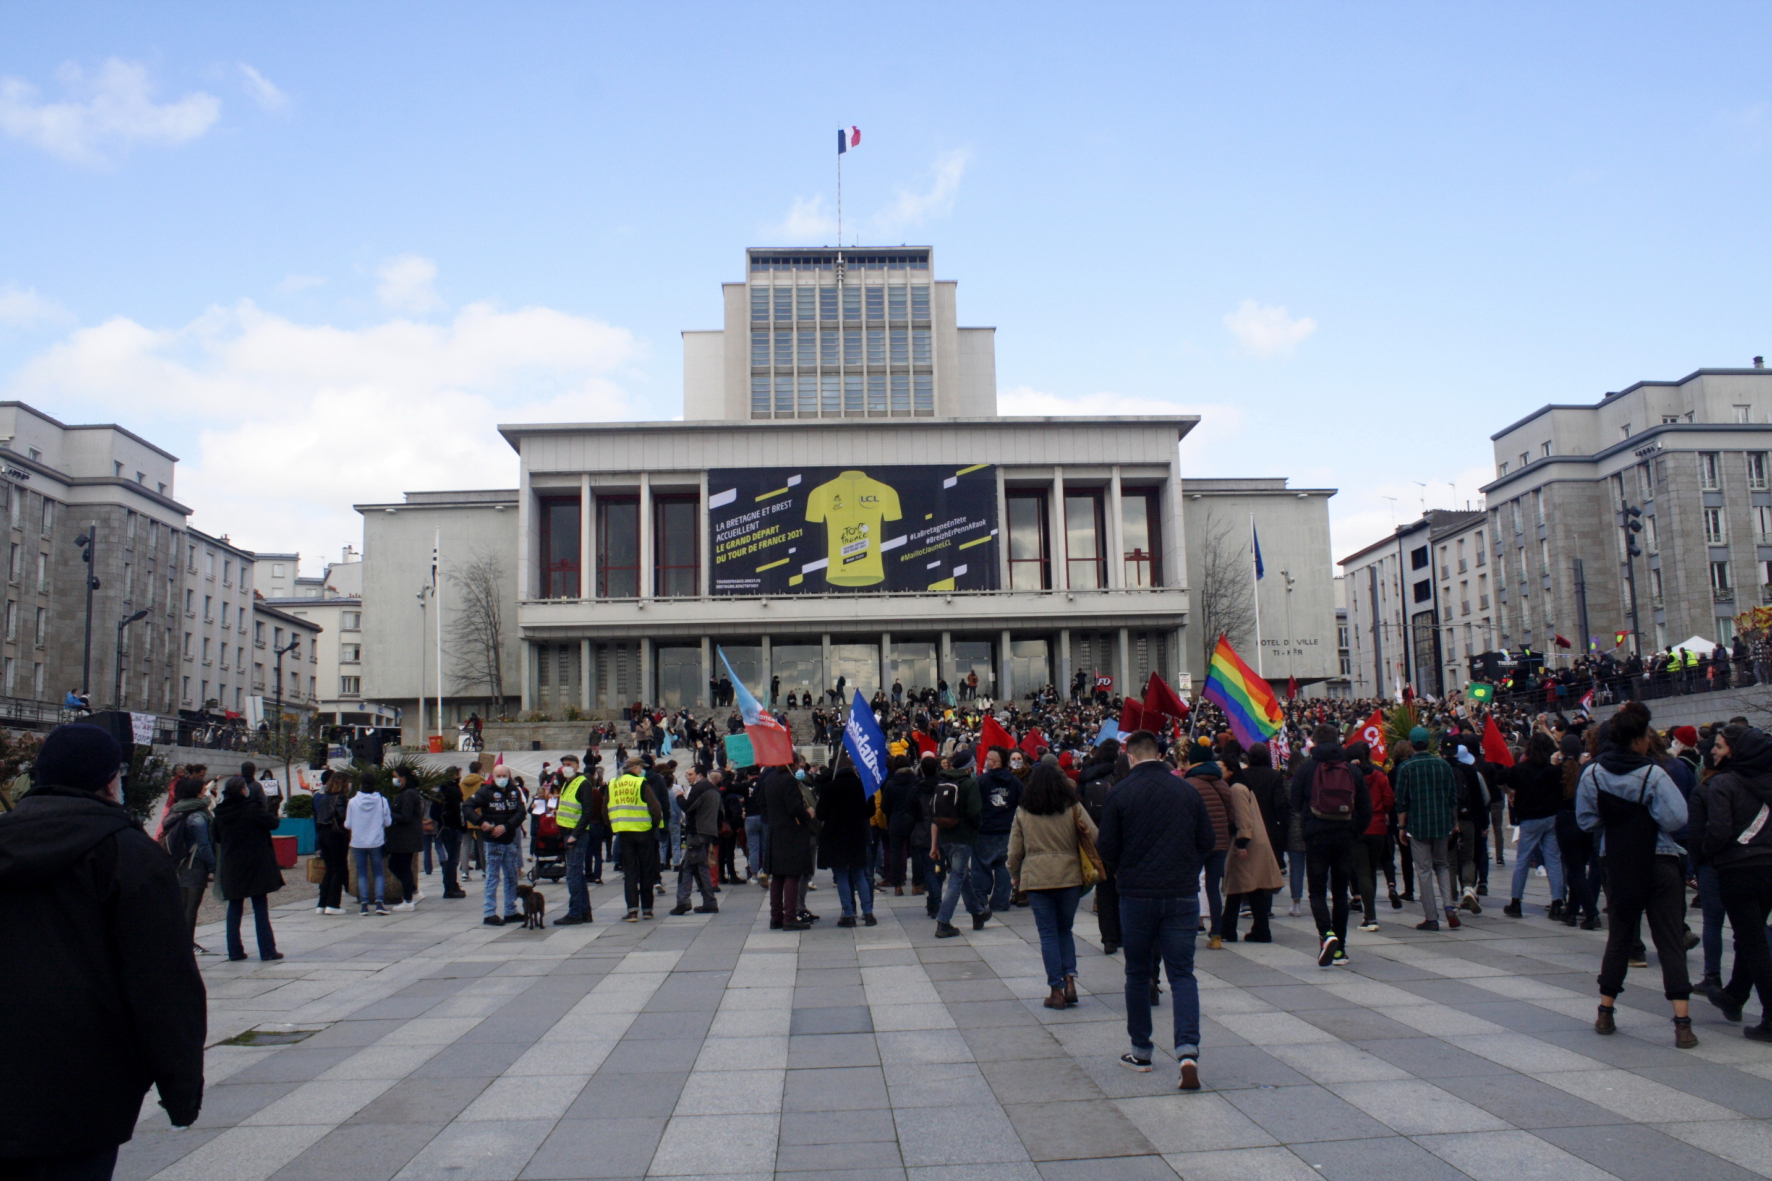 Manif-culture-Brest-20-03-21-216